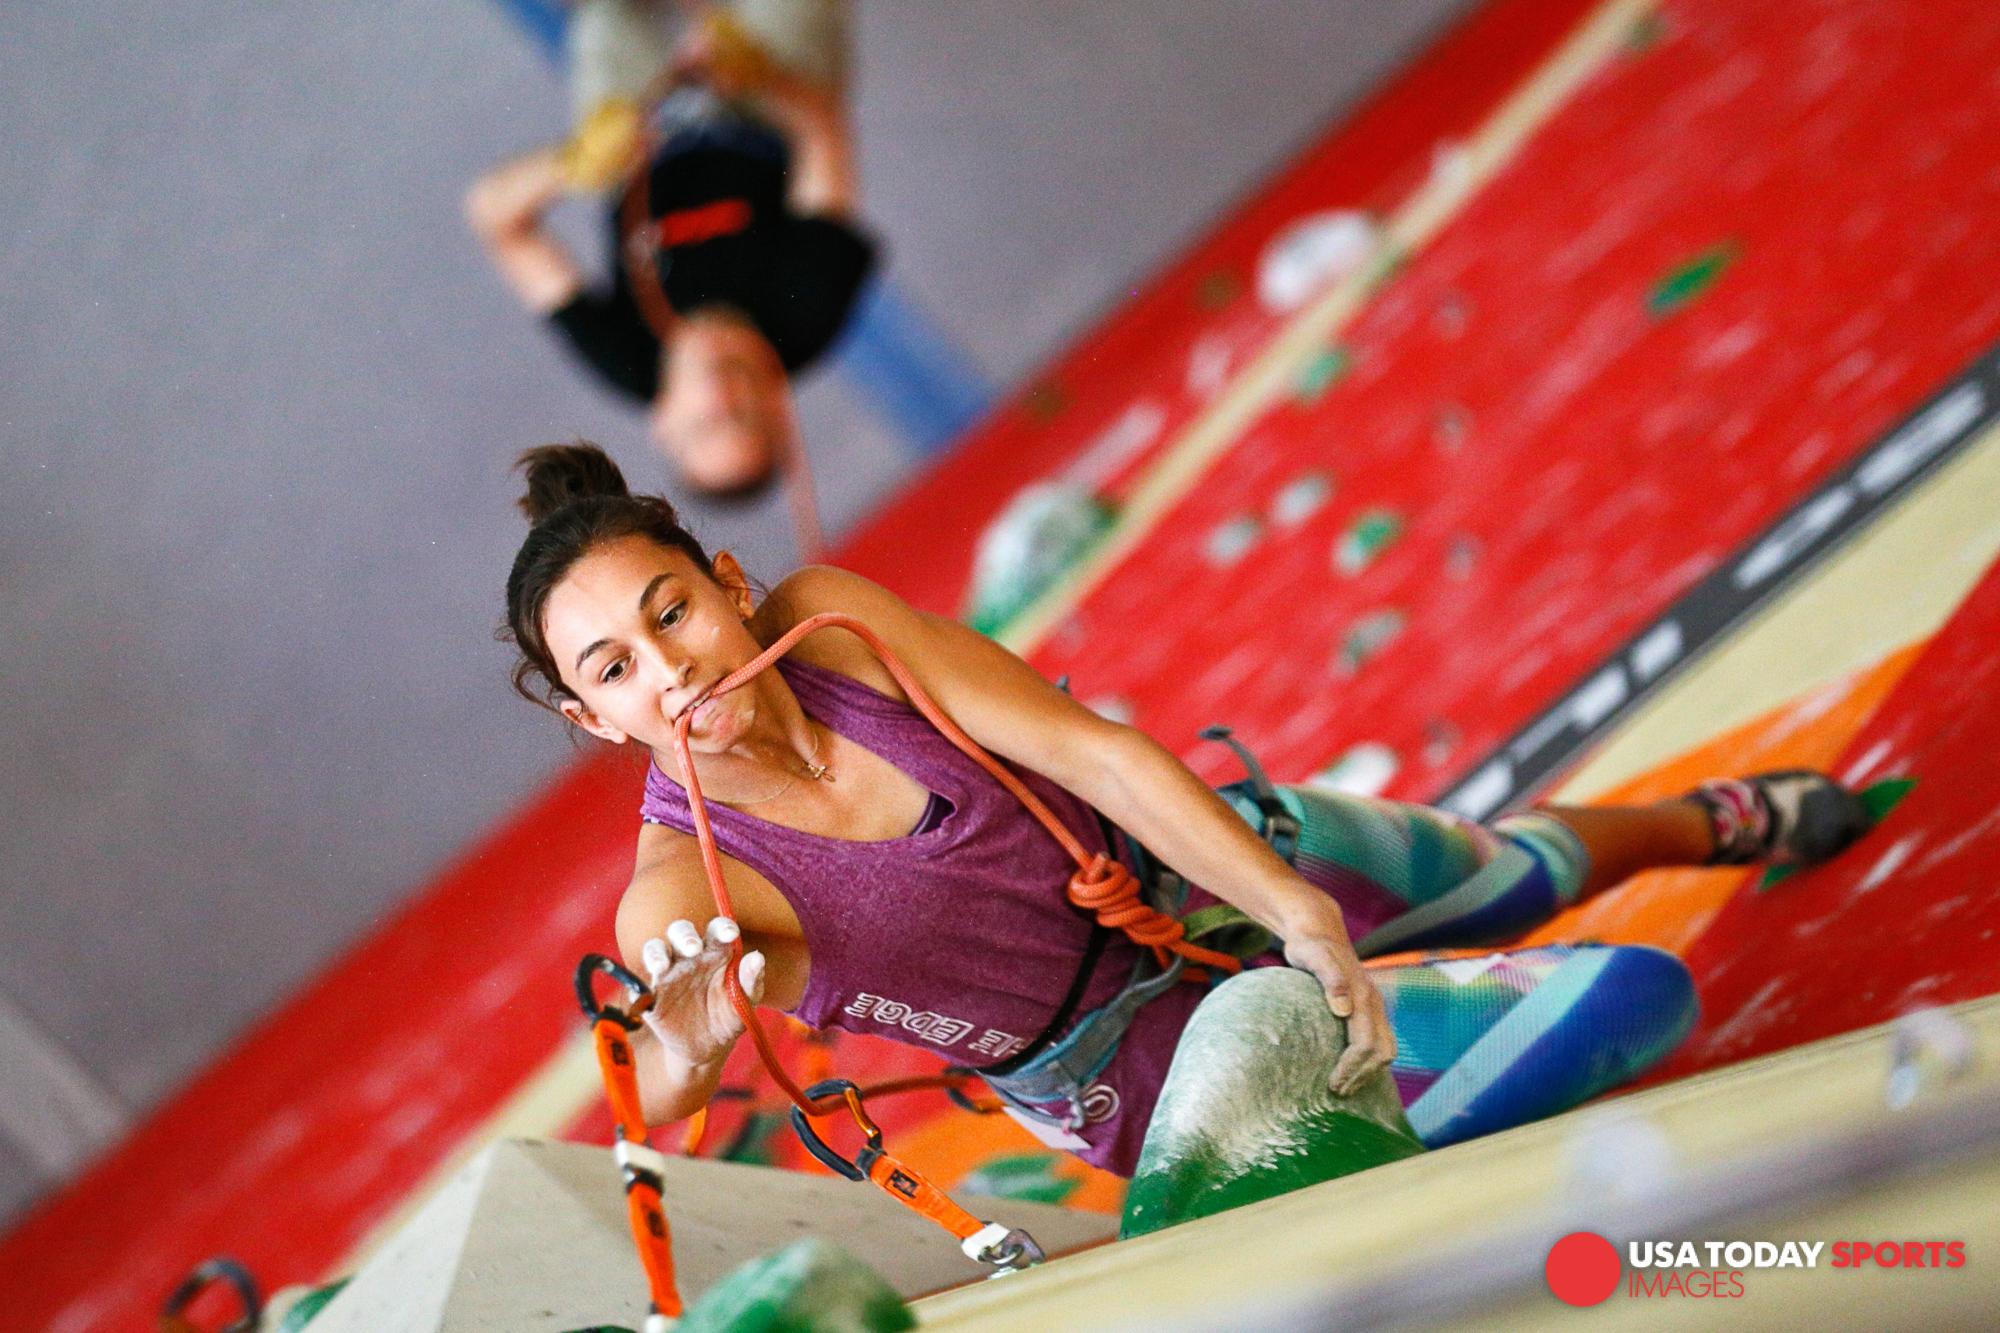 Garrett_Reid_atlanta_advertising_commercial_photographer_sport_and_speed_youth_national_chap_climbing-22.jpg